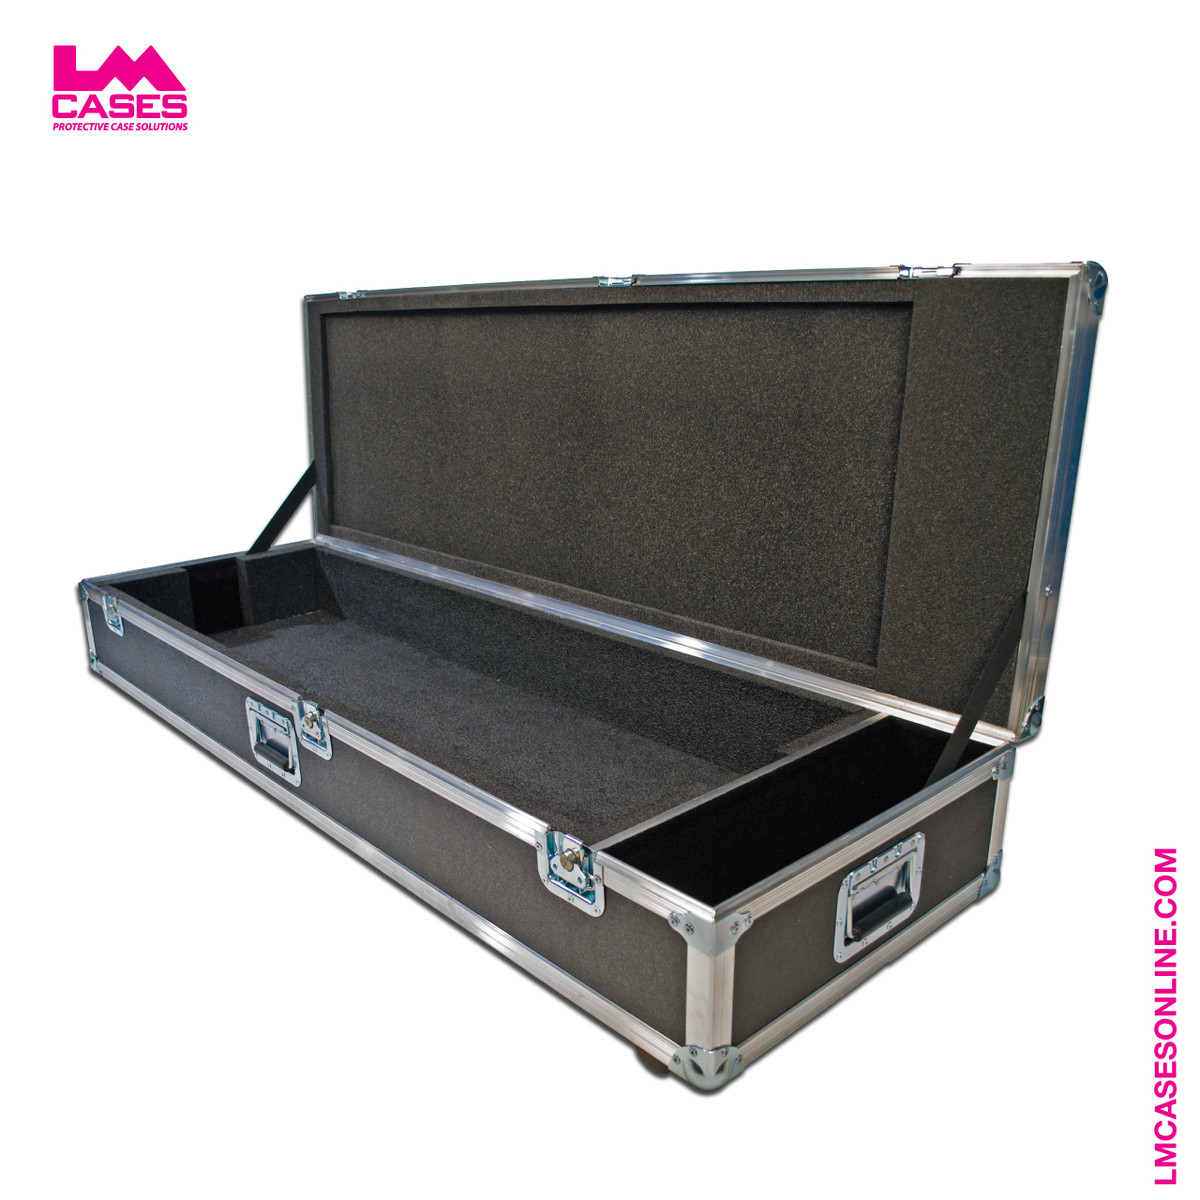 Yamaha Motif 8 Tour Case w/Sustain Pedal Storage